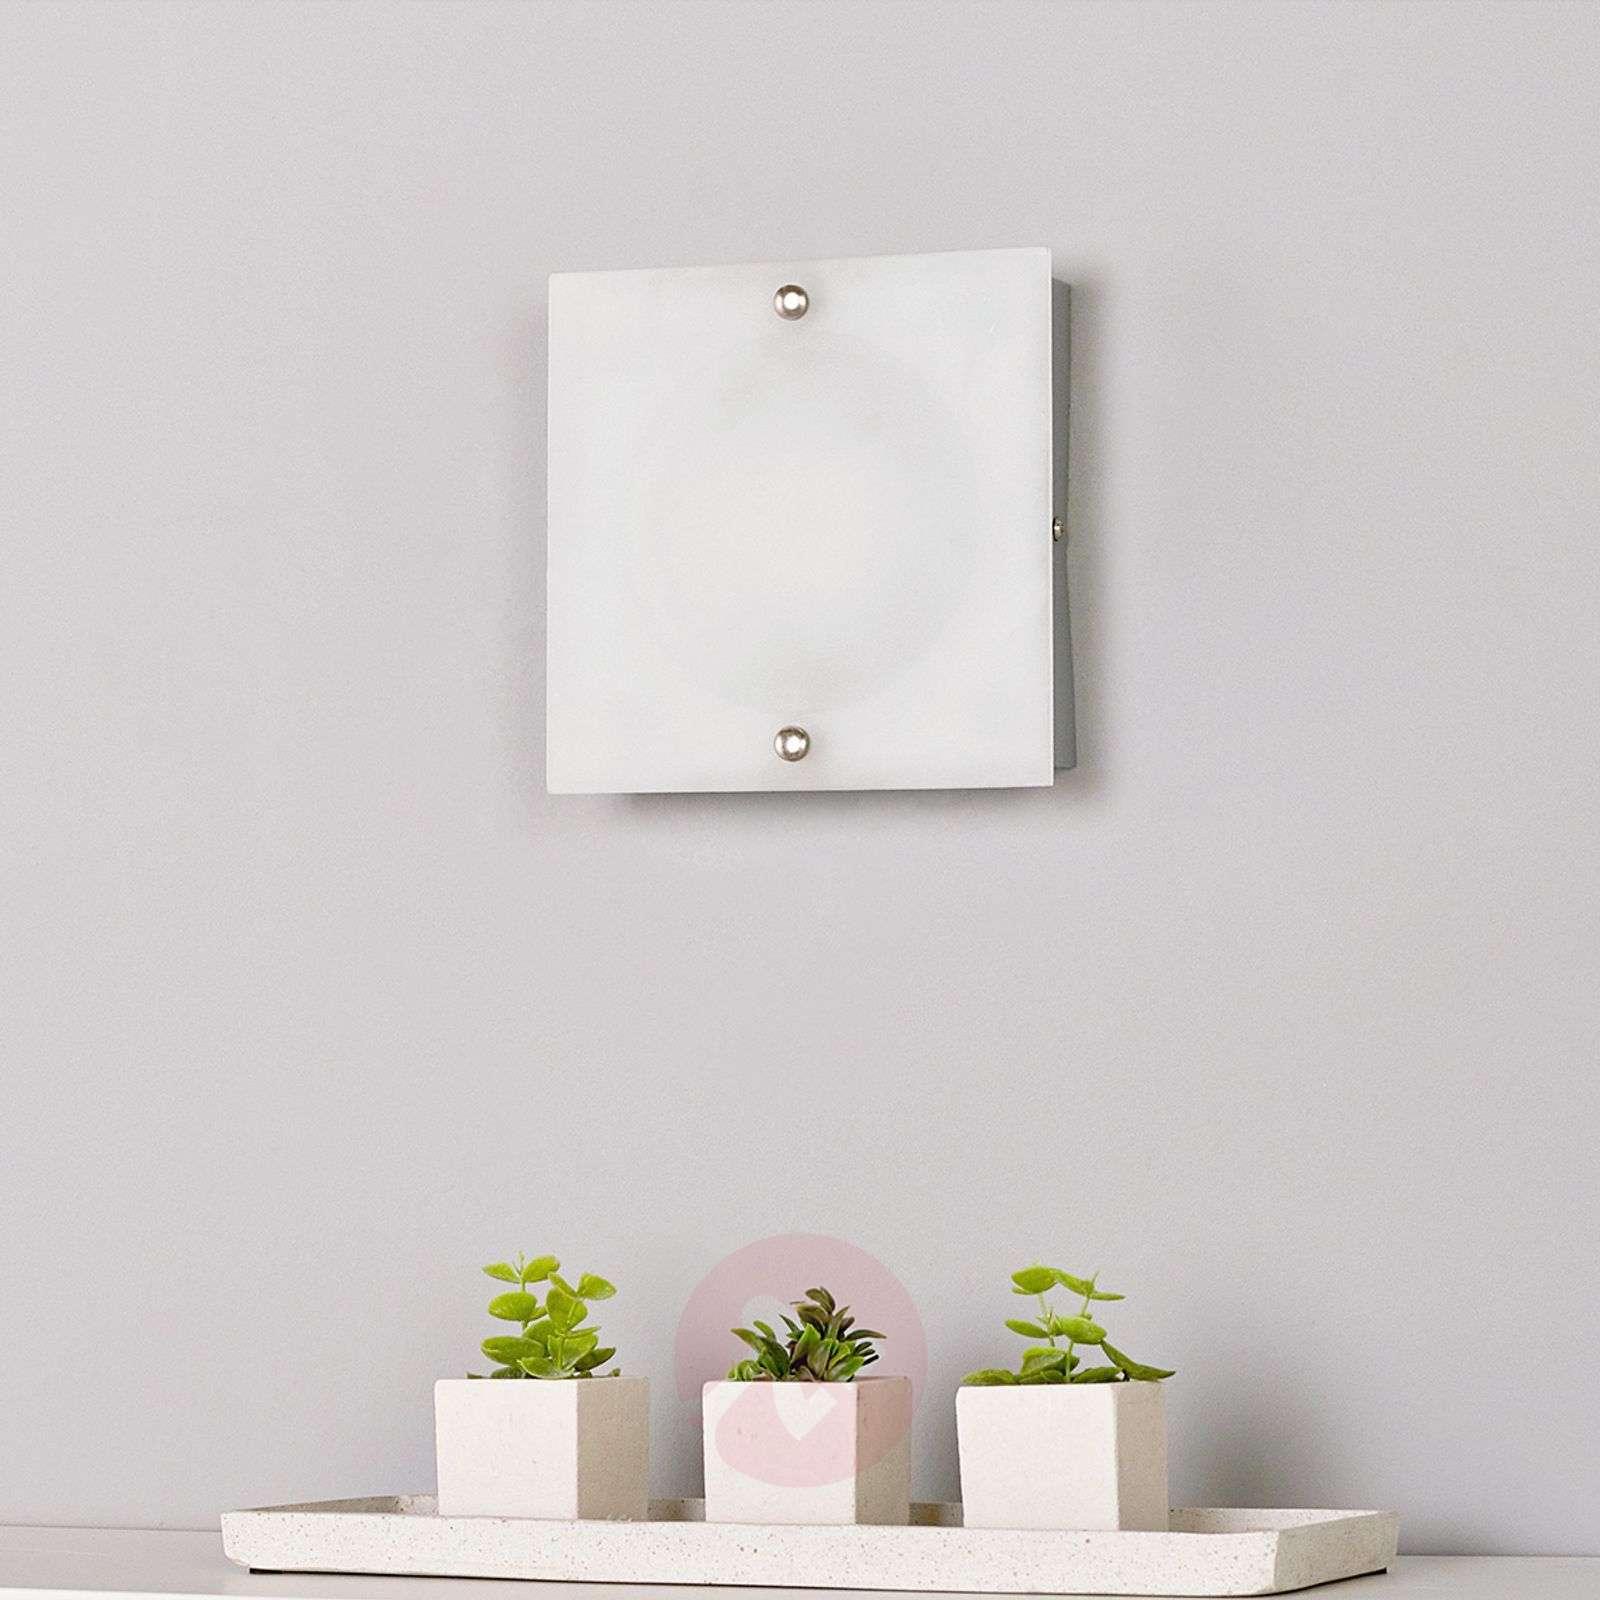 Decorative LED wall light Annika-9625082-01